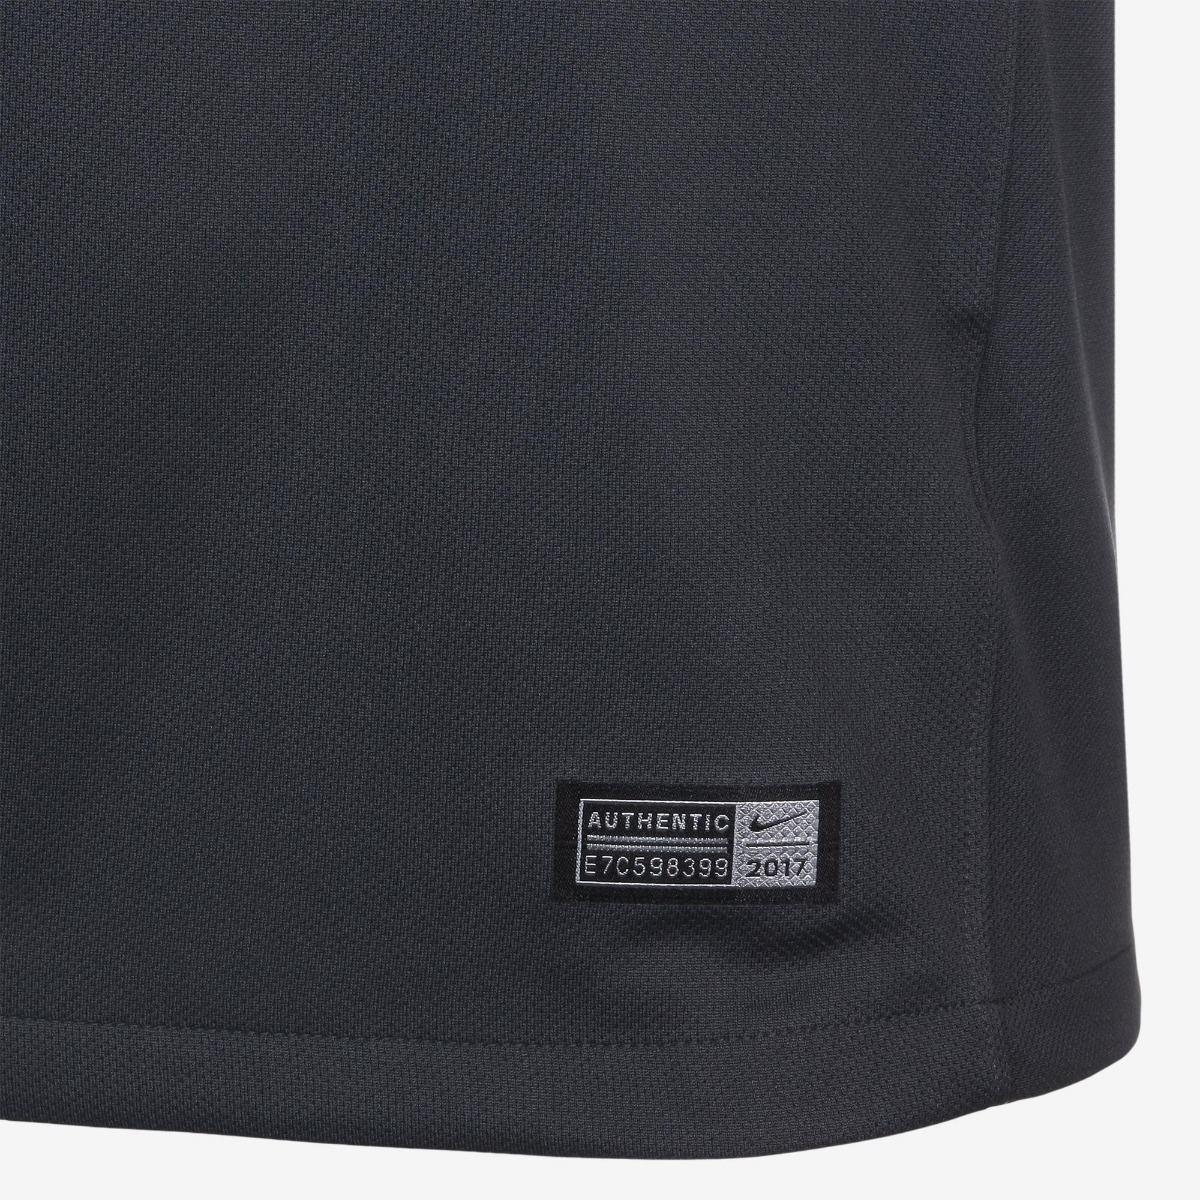 camisa nike corinthians cinza laranja terceiro uniforme 2017. Carregando  zoom. 619bec7ec7fef